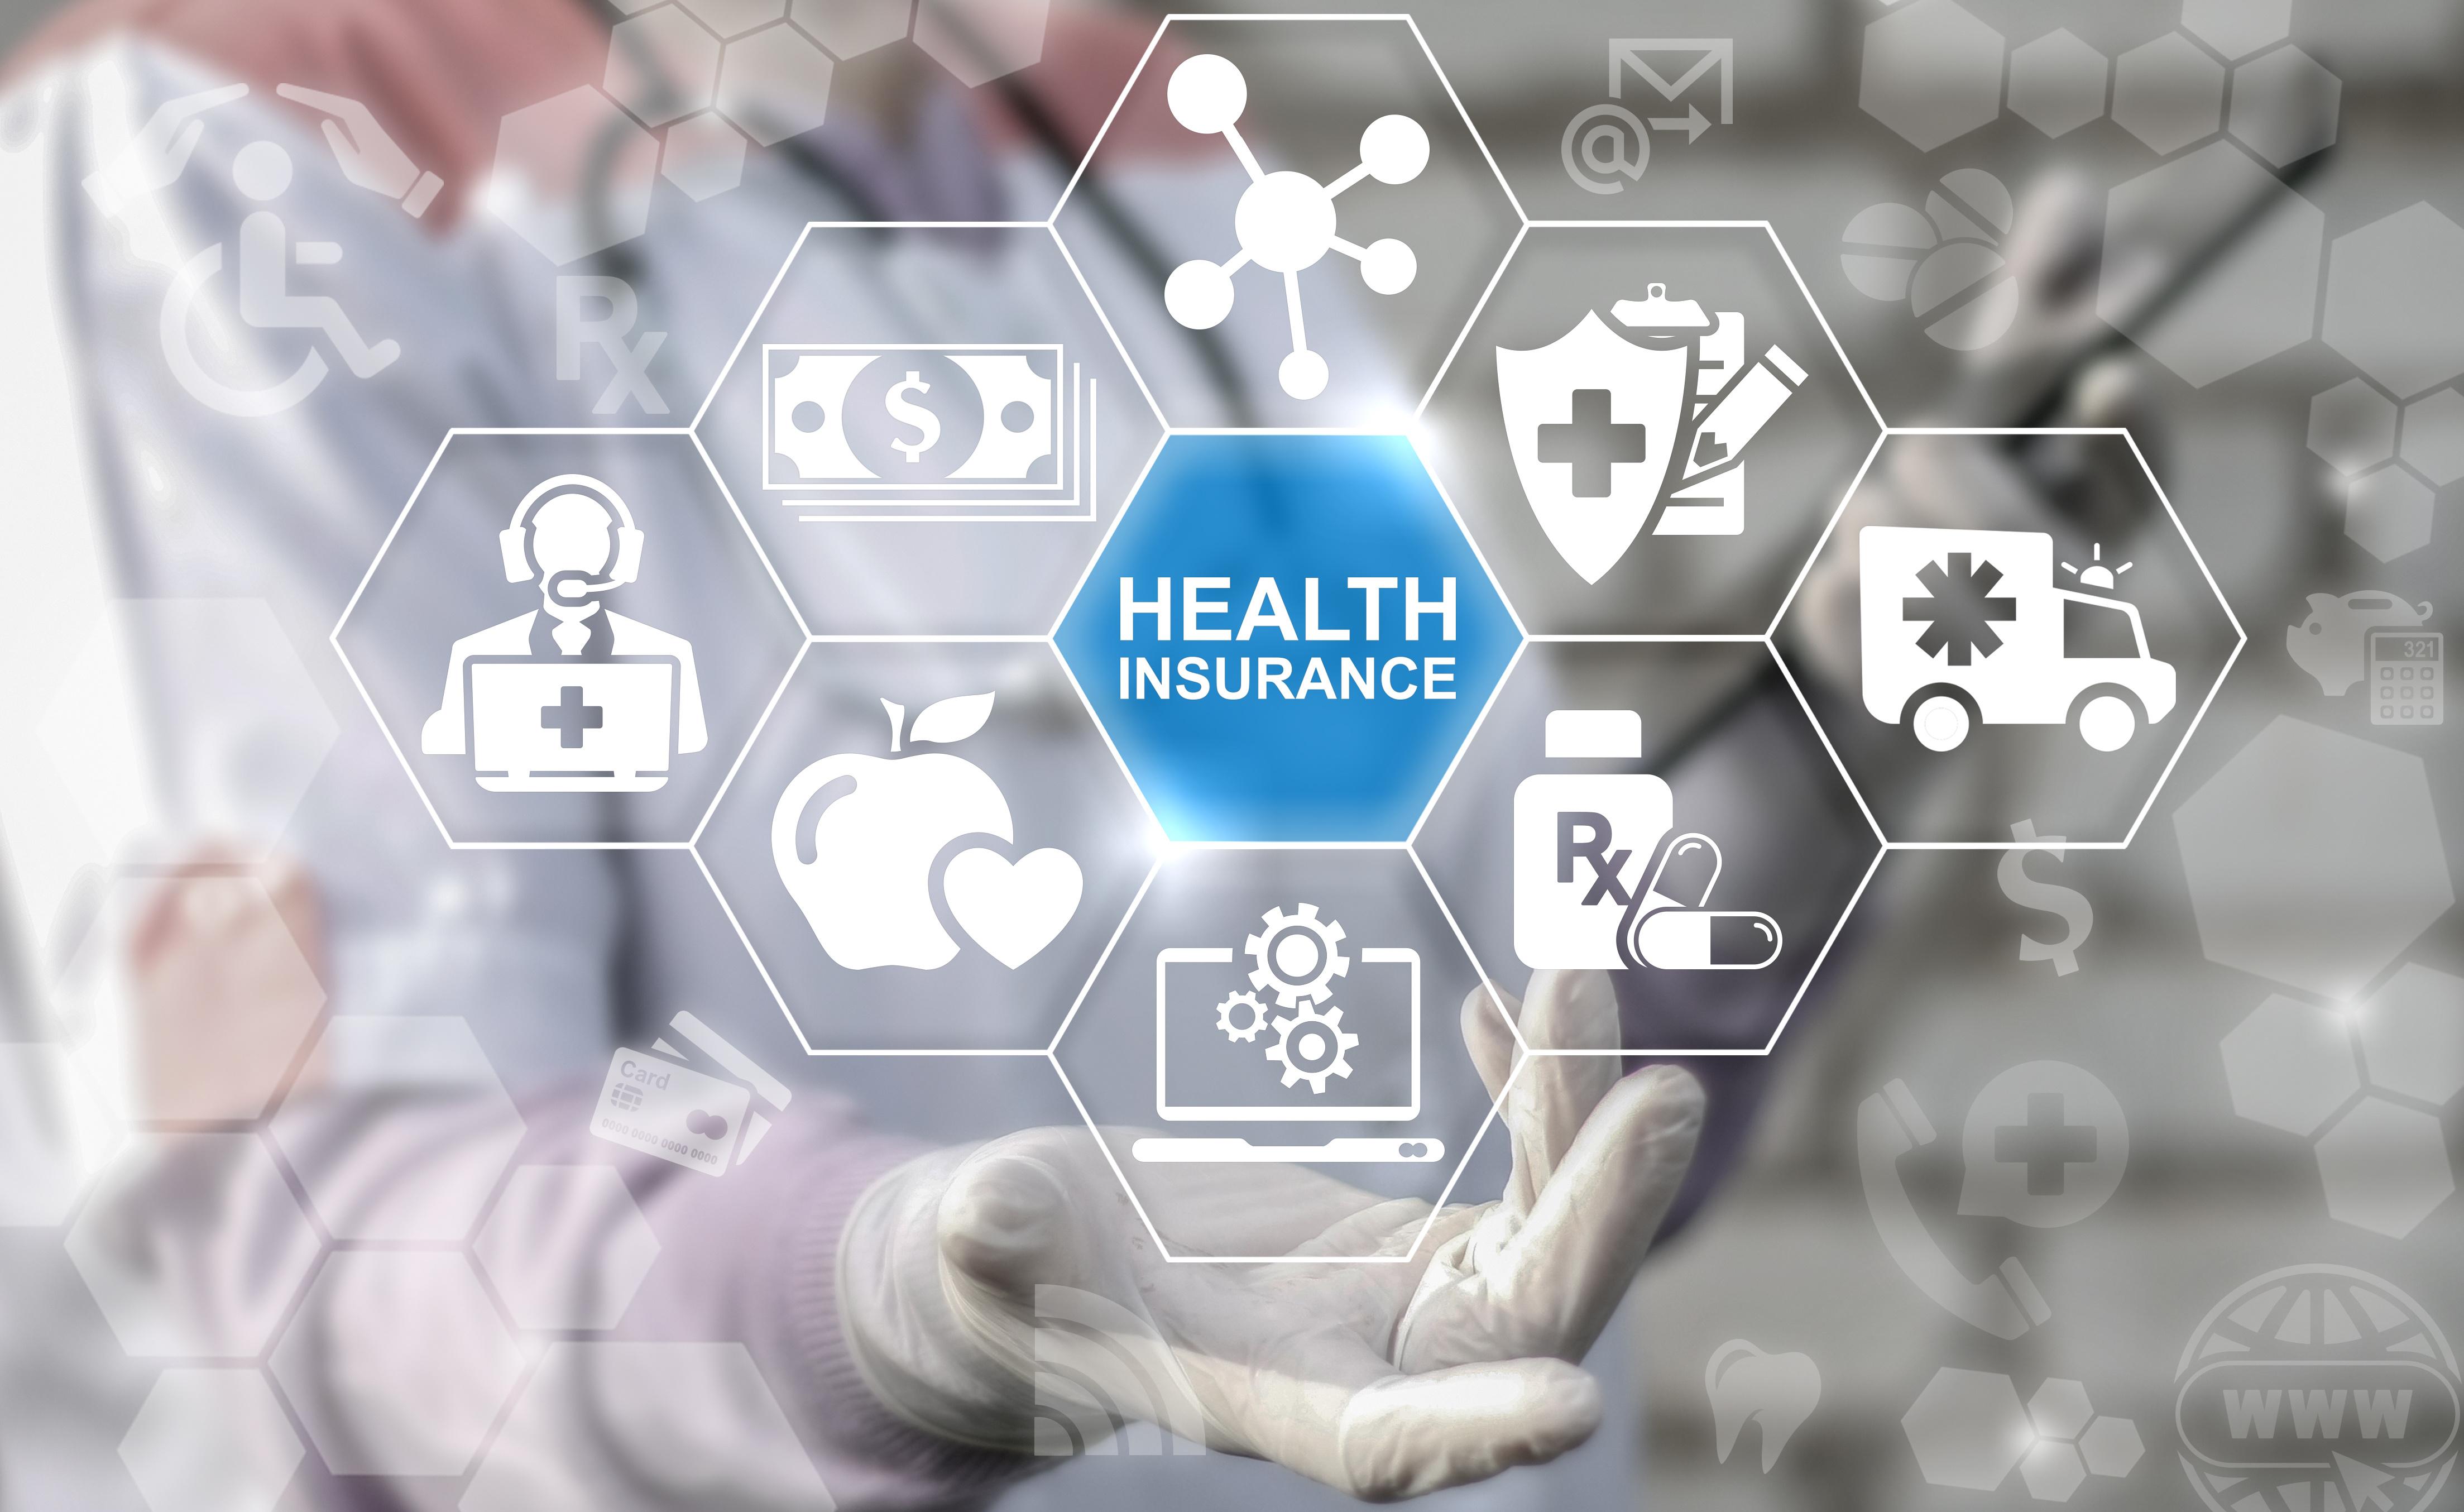 Health insurance medicine safety finance treatment computer concept. Healthcare medical assurance help money premium healthy web technology.